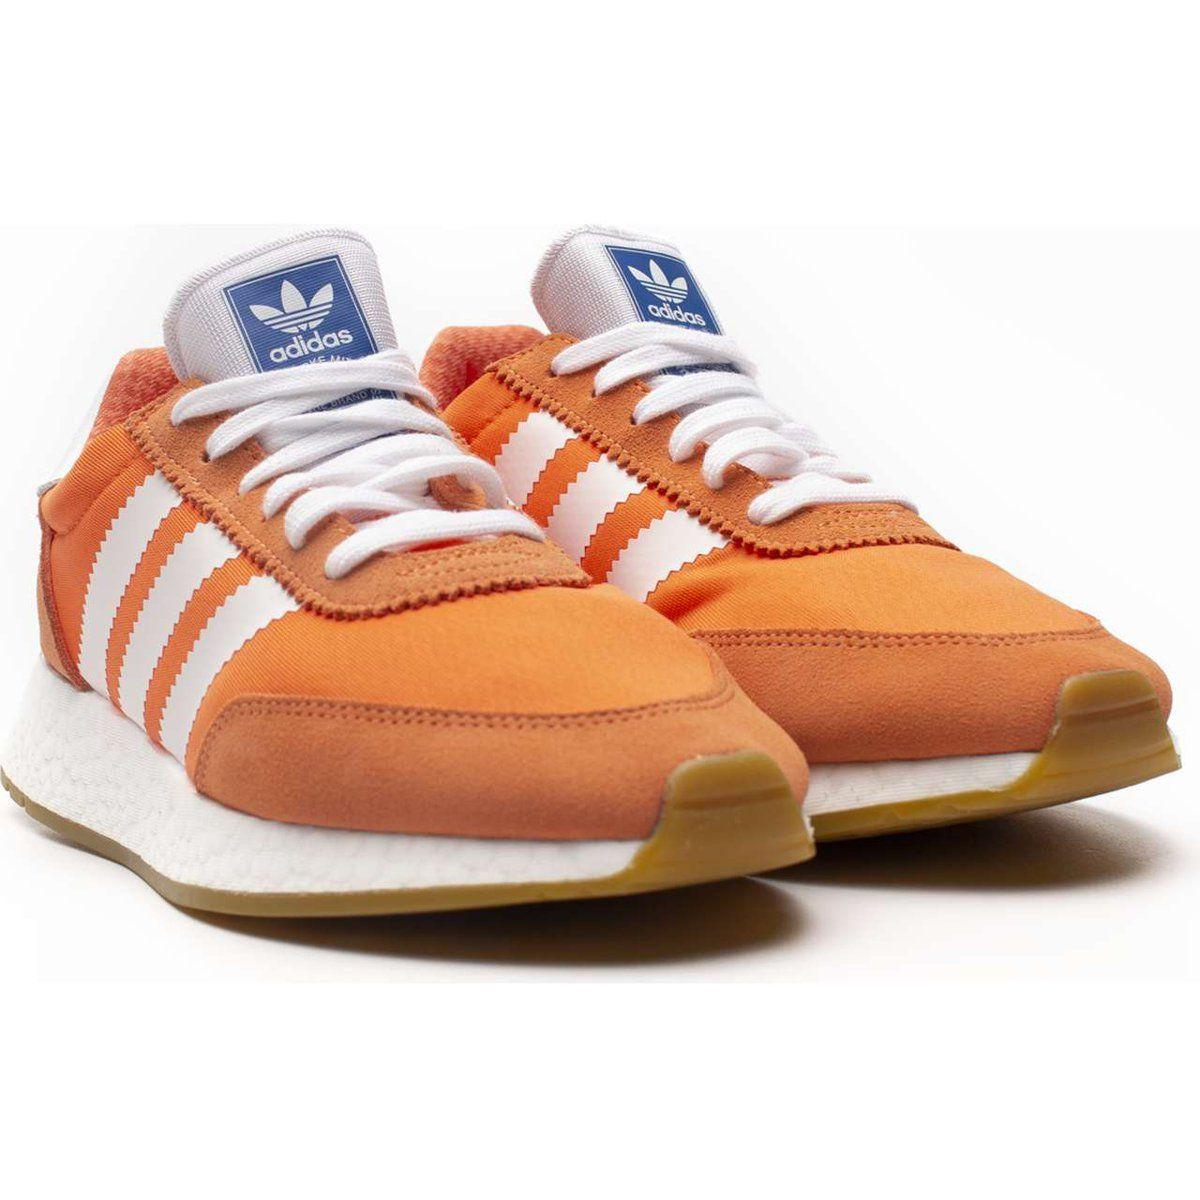 Sportowe Damskie Adidas Adidas Wielokolorowe I 5923 950 Semi Coral Footwear White Gum 3 Adidas Samba Sneakers Adidas Samba Adidas Sneakers